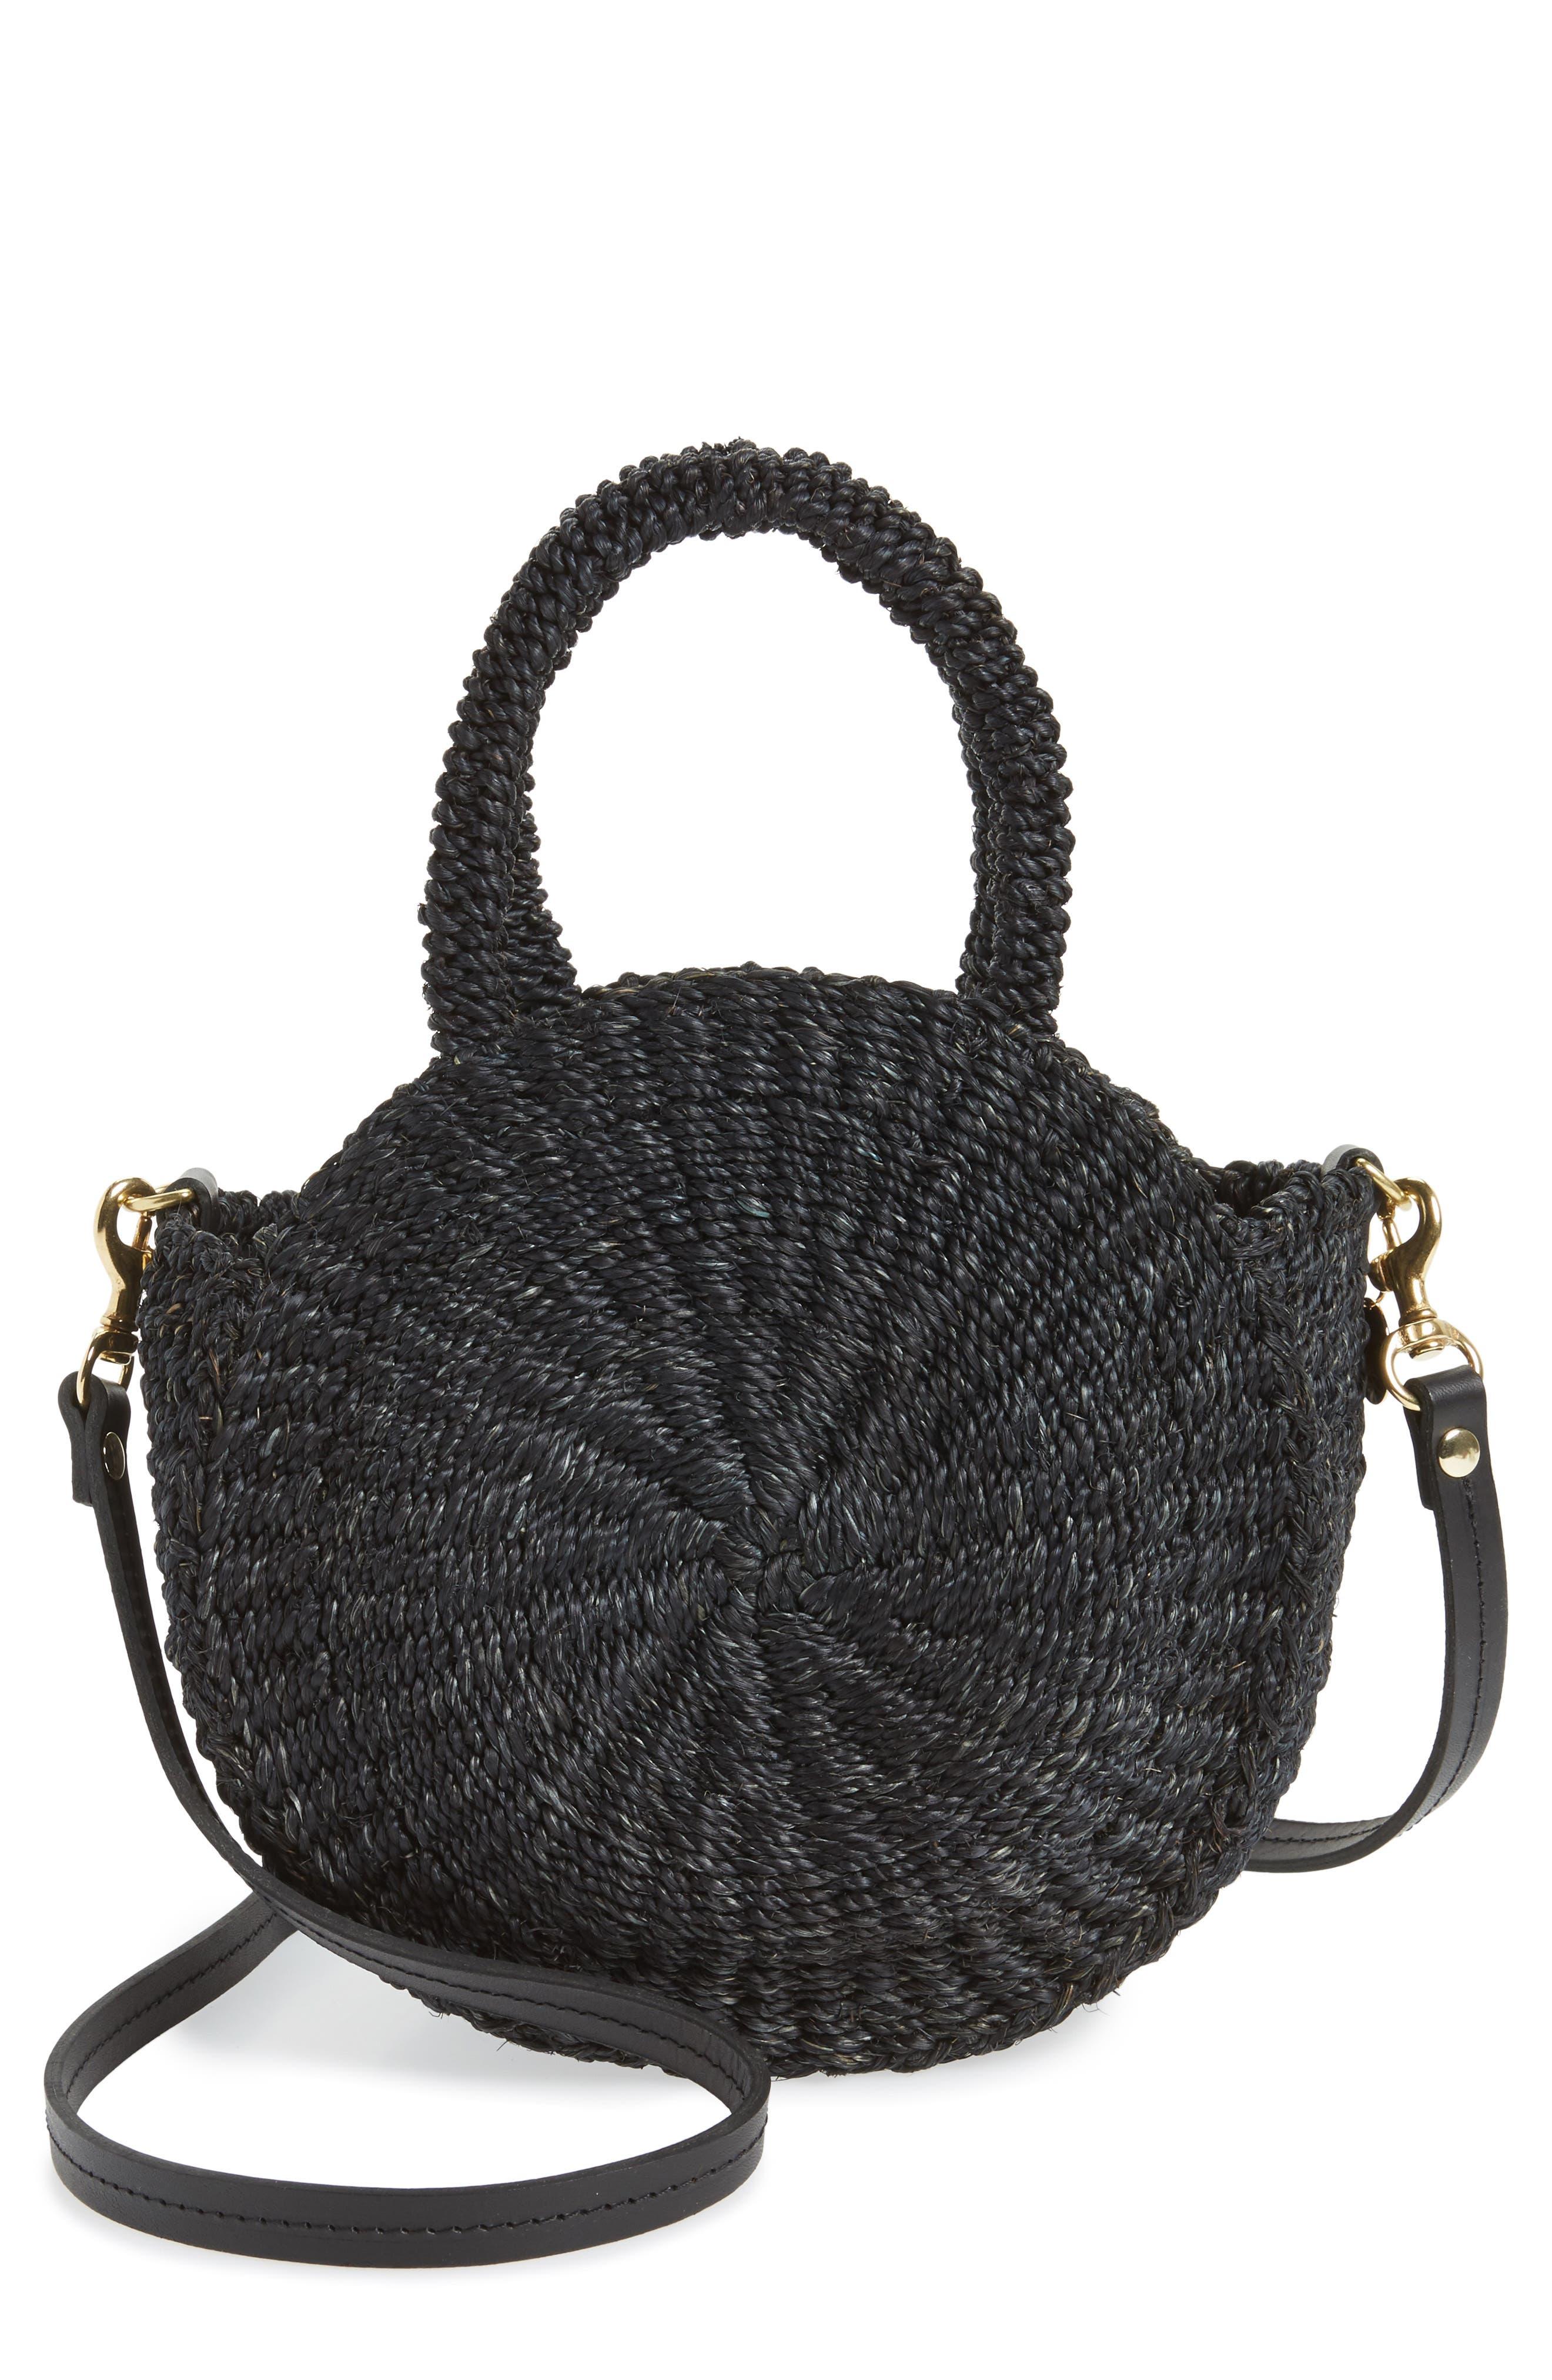 Petite Alice Straw Bag,                             Main thumbnail 1, color,                             BLACK WOVEN